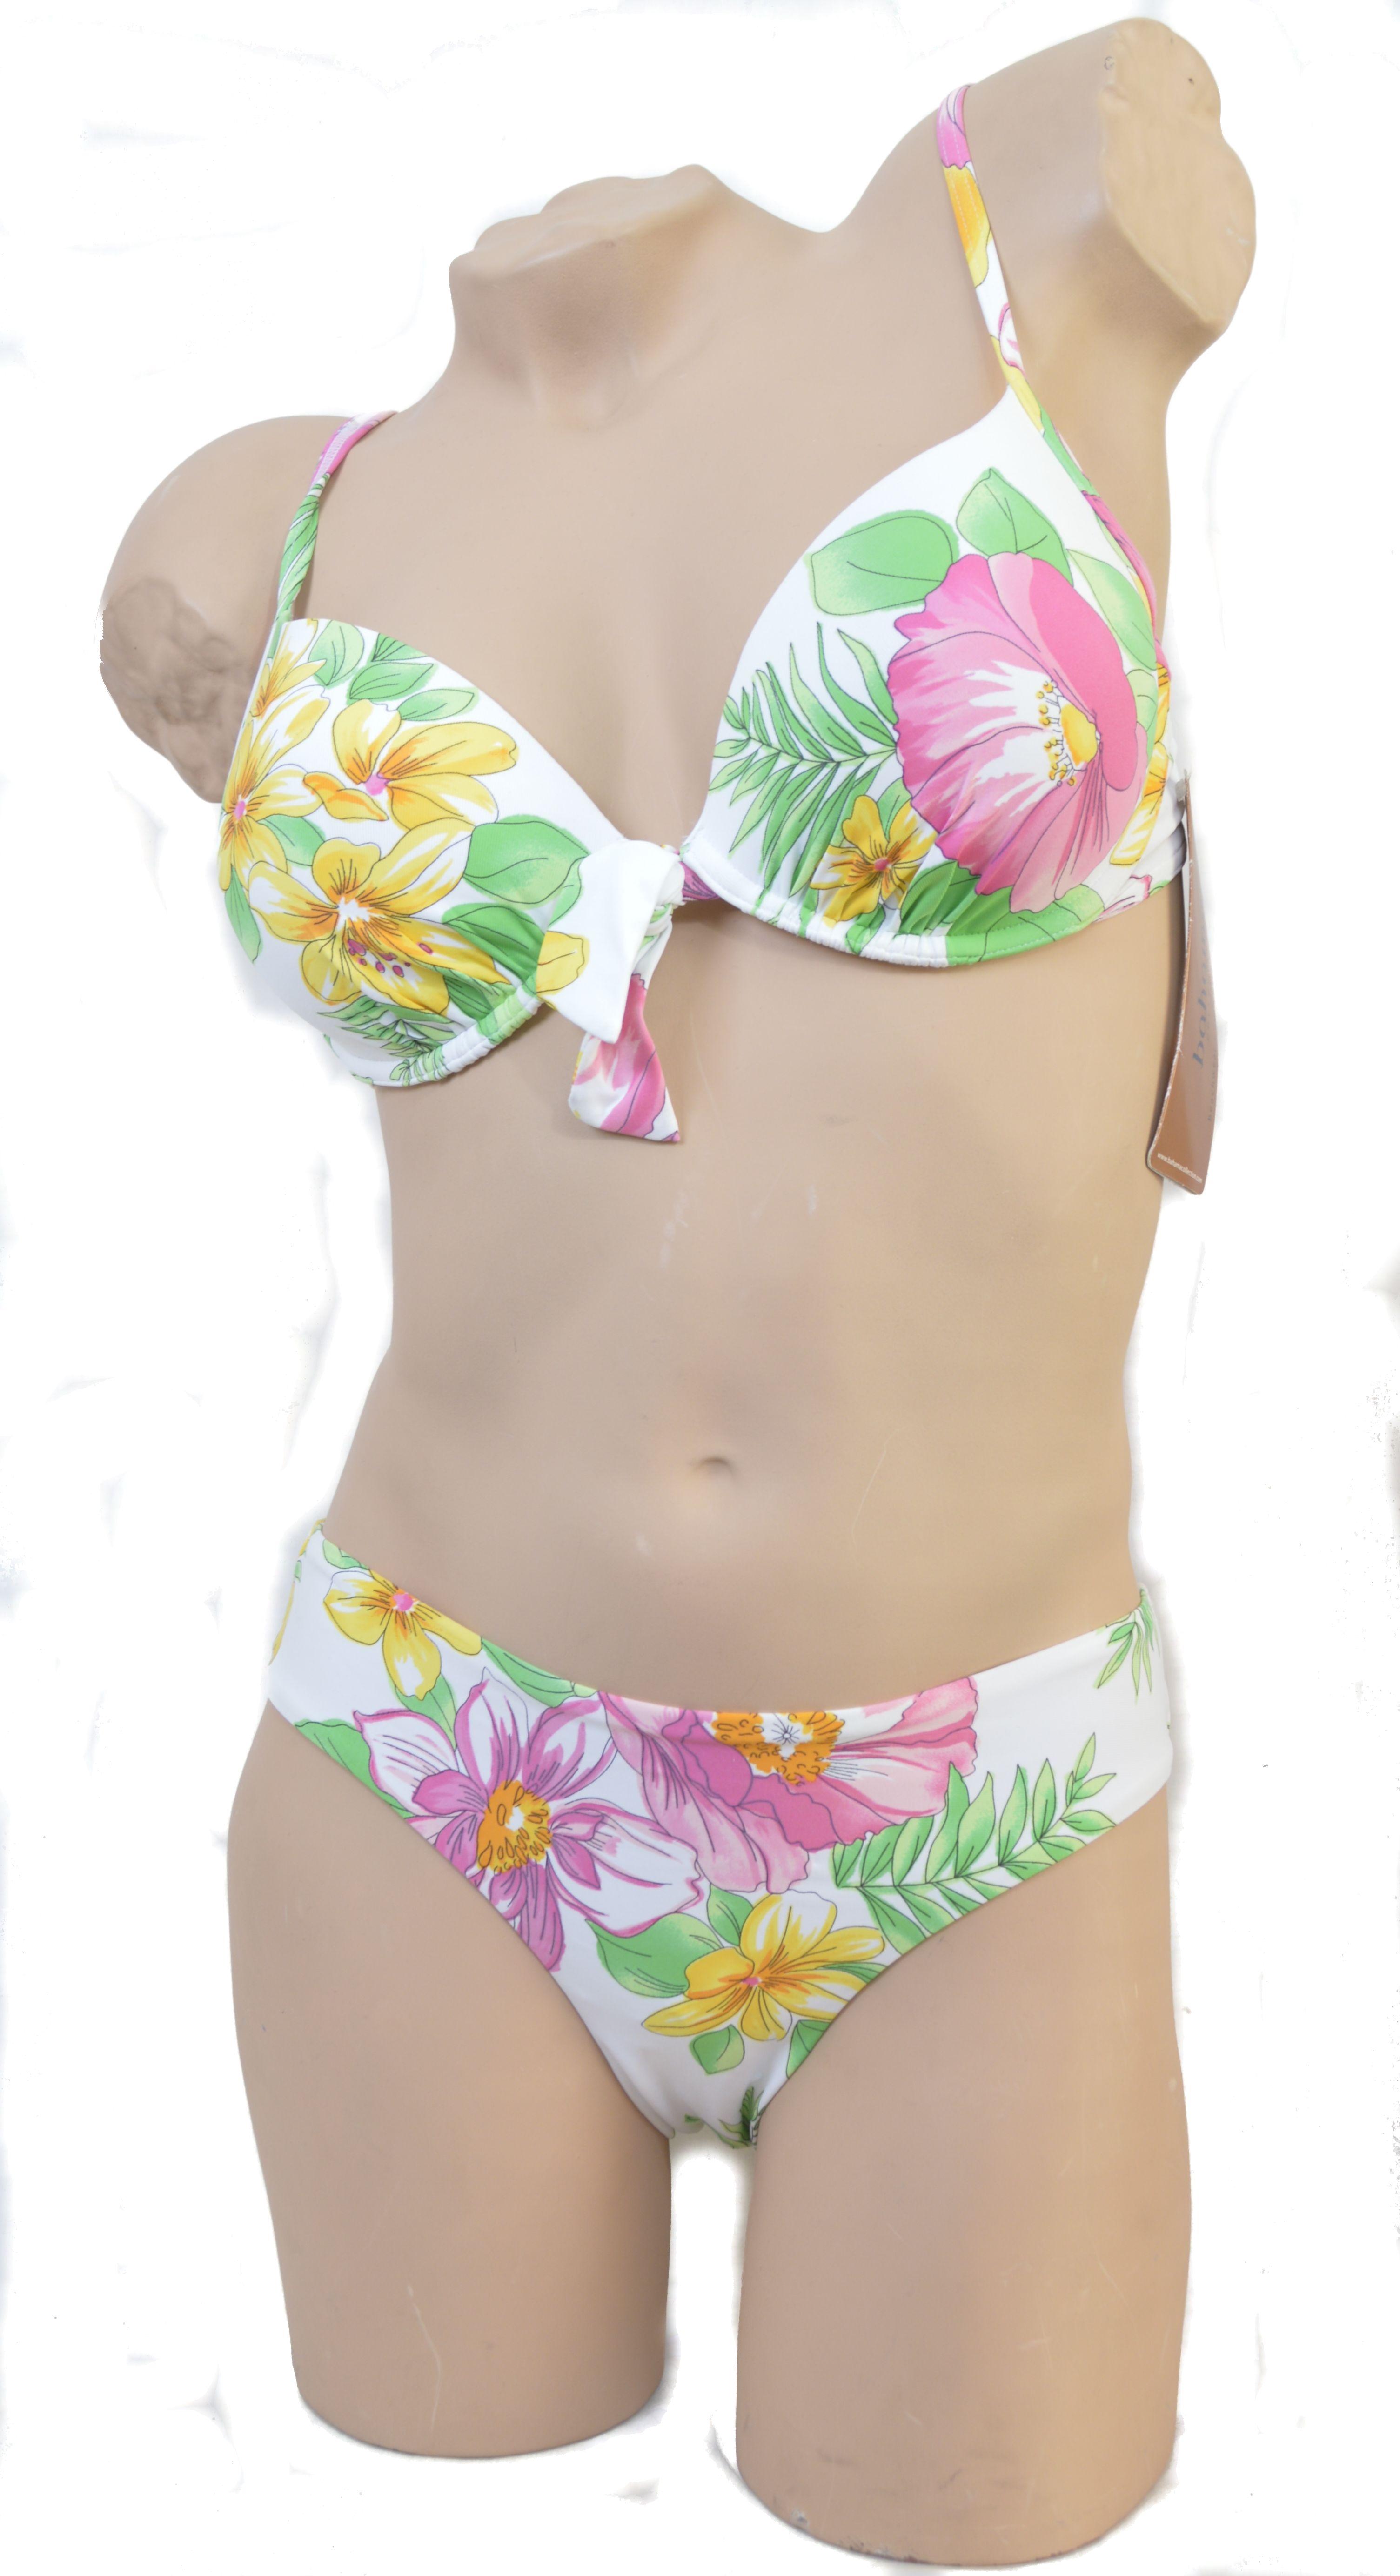 Bahama Beach push-up bikini in wit met bloemprint.